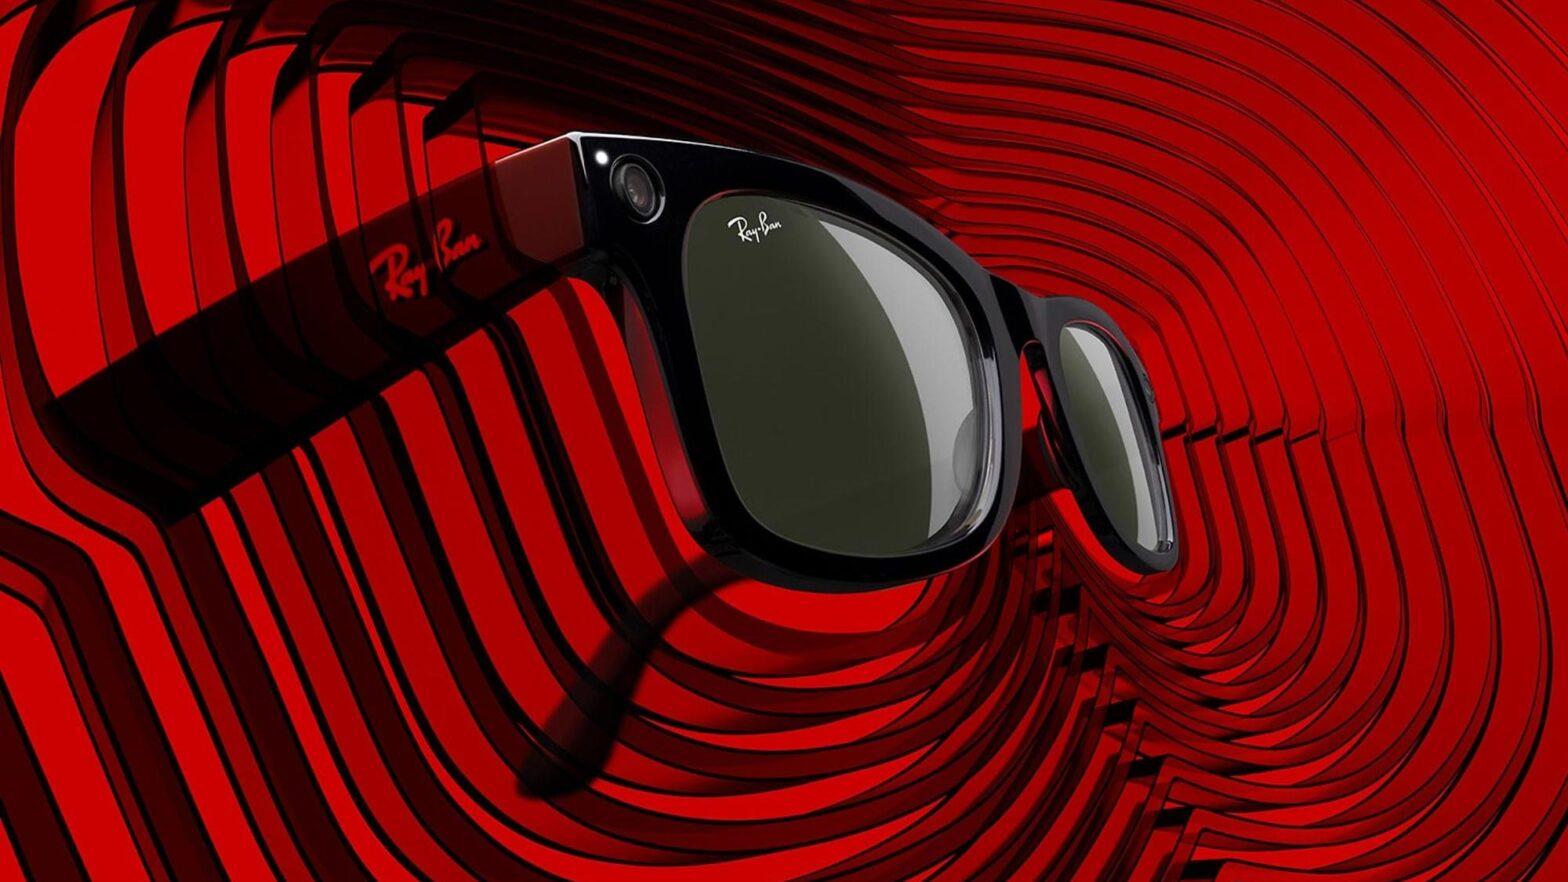 Ray-Ban x Facebook Ray-Ban Stories Smart Glasses